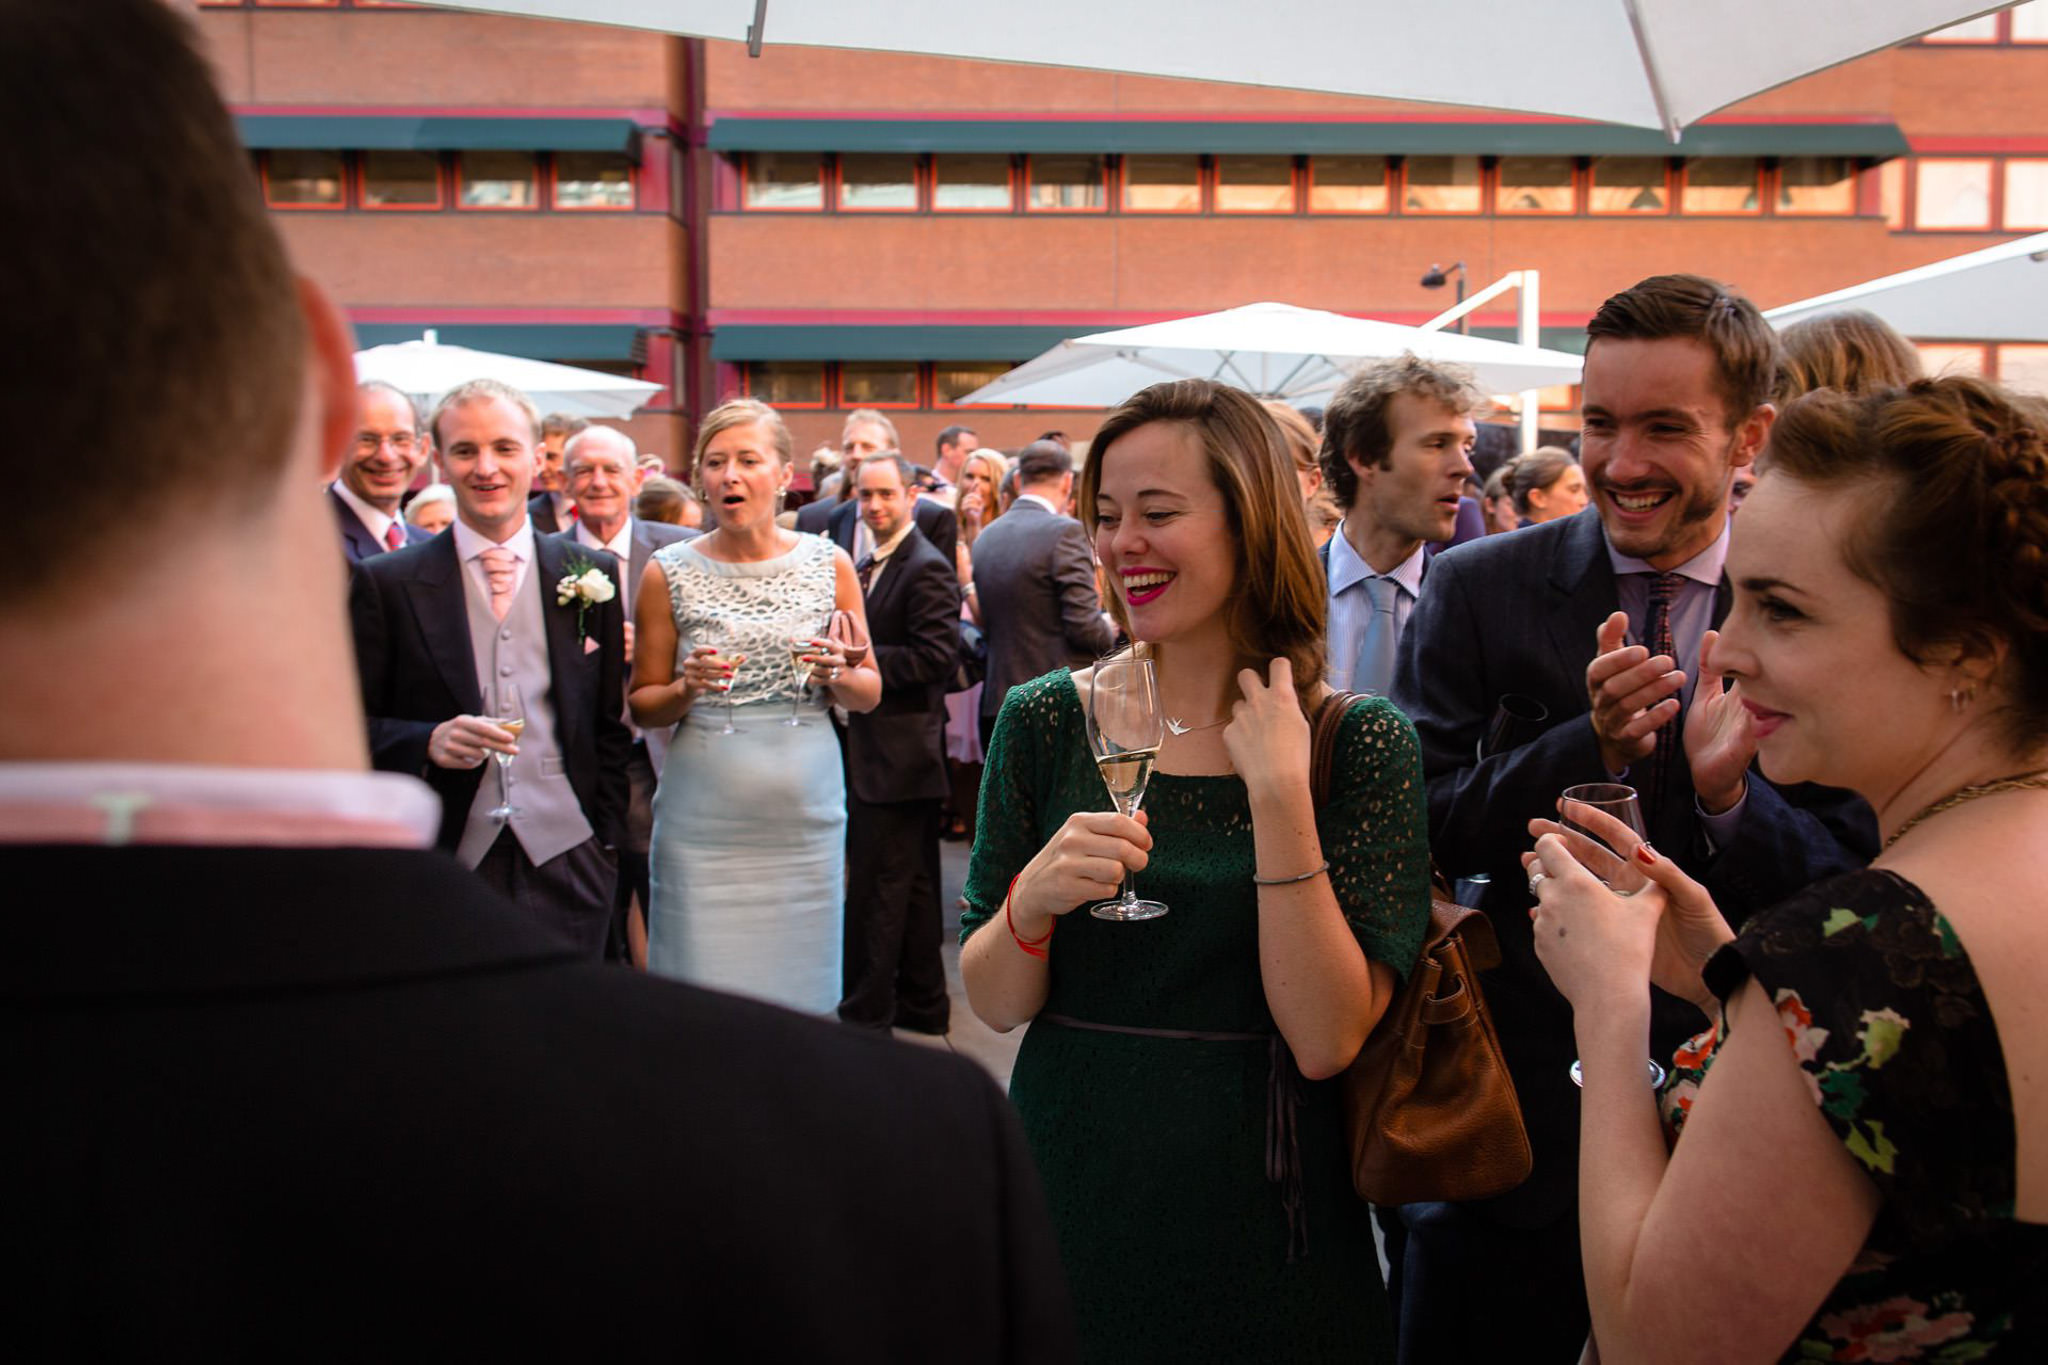 St. Pancras hotel wedding mingling